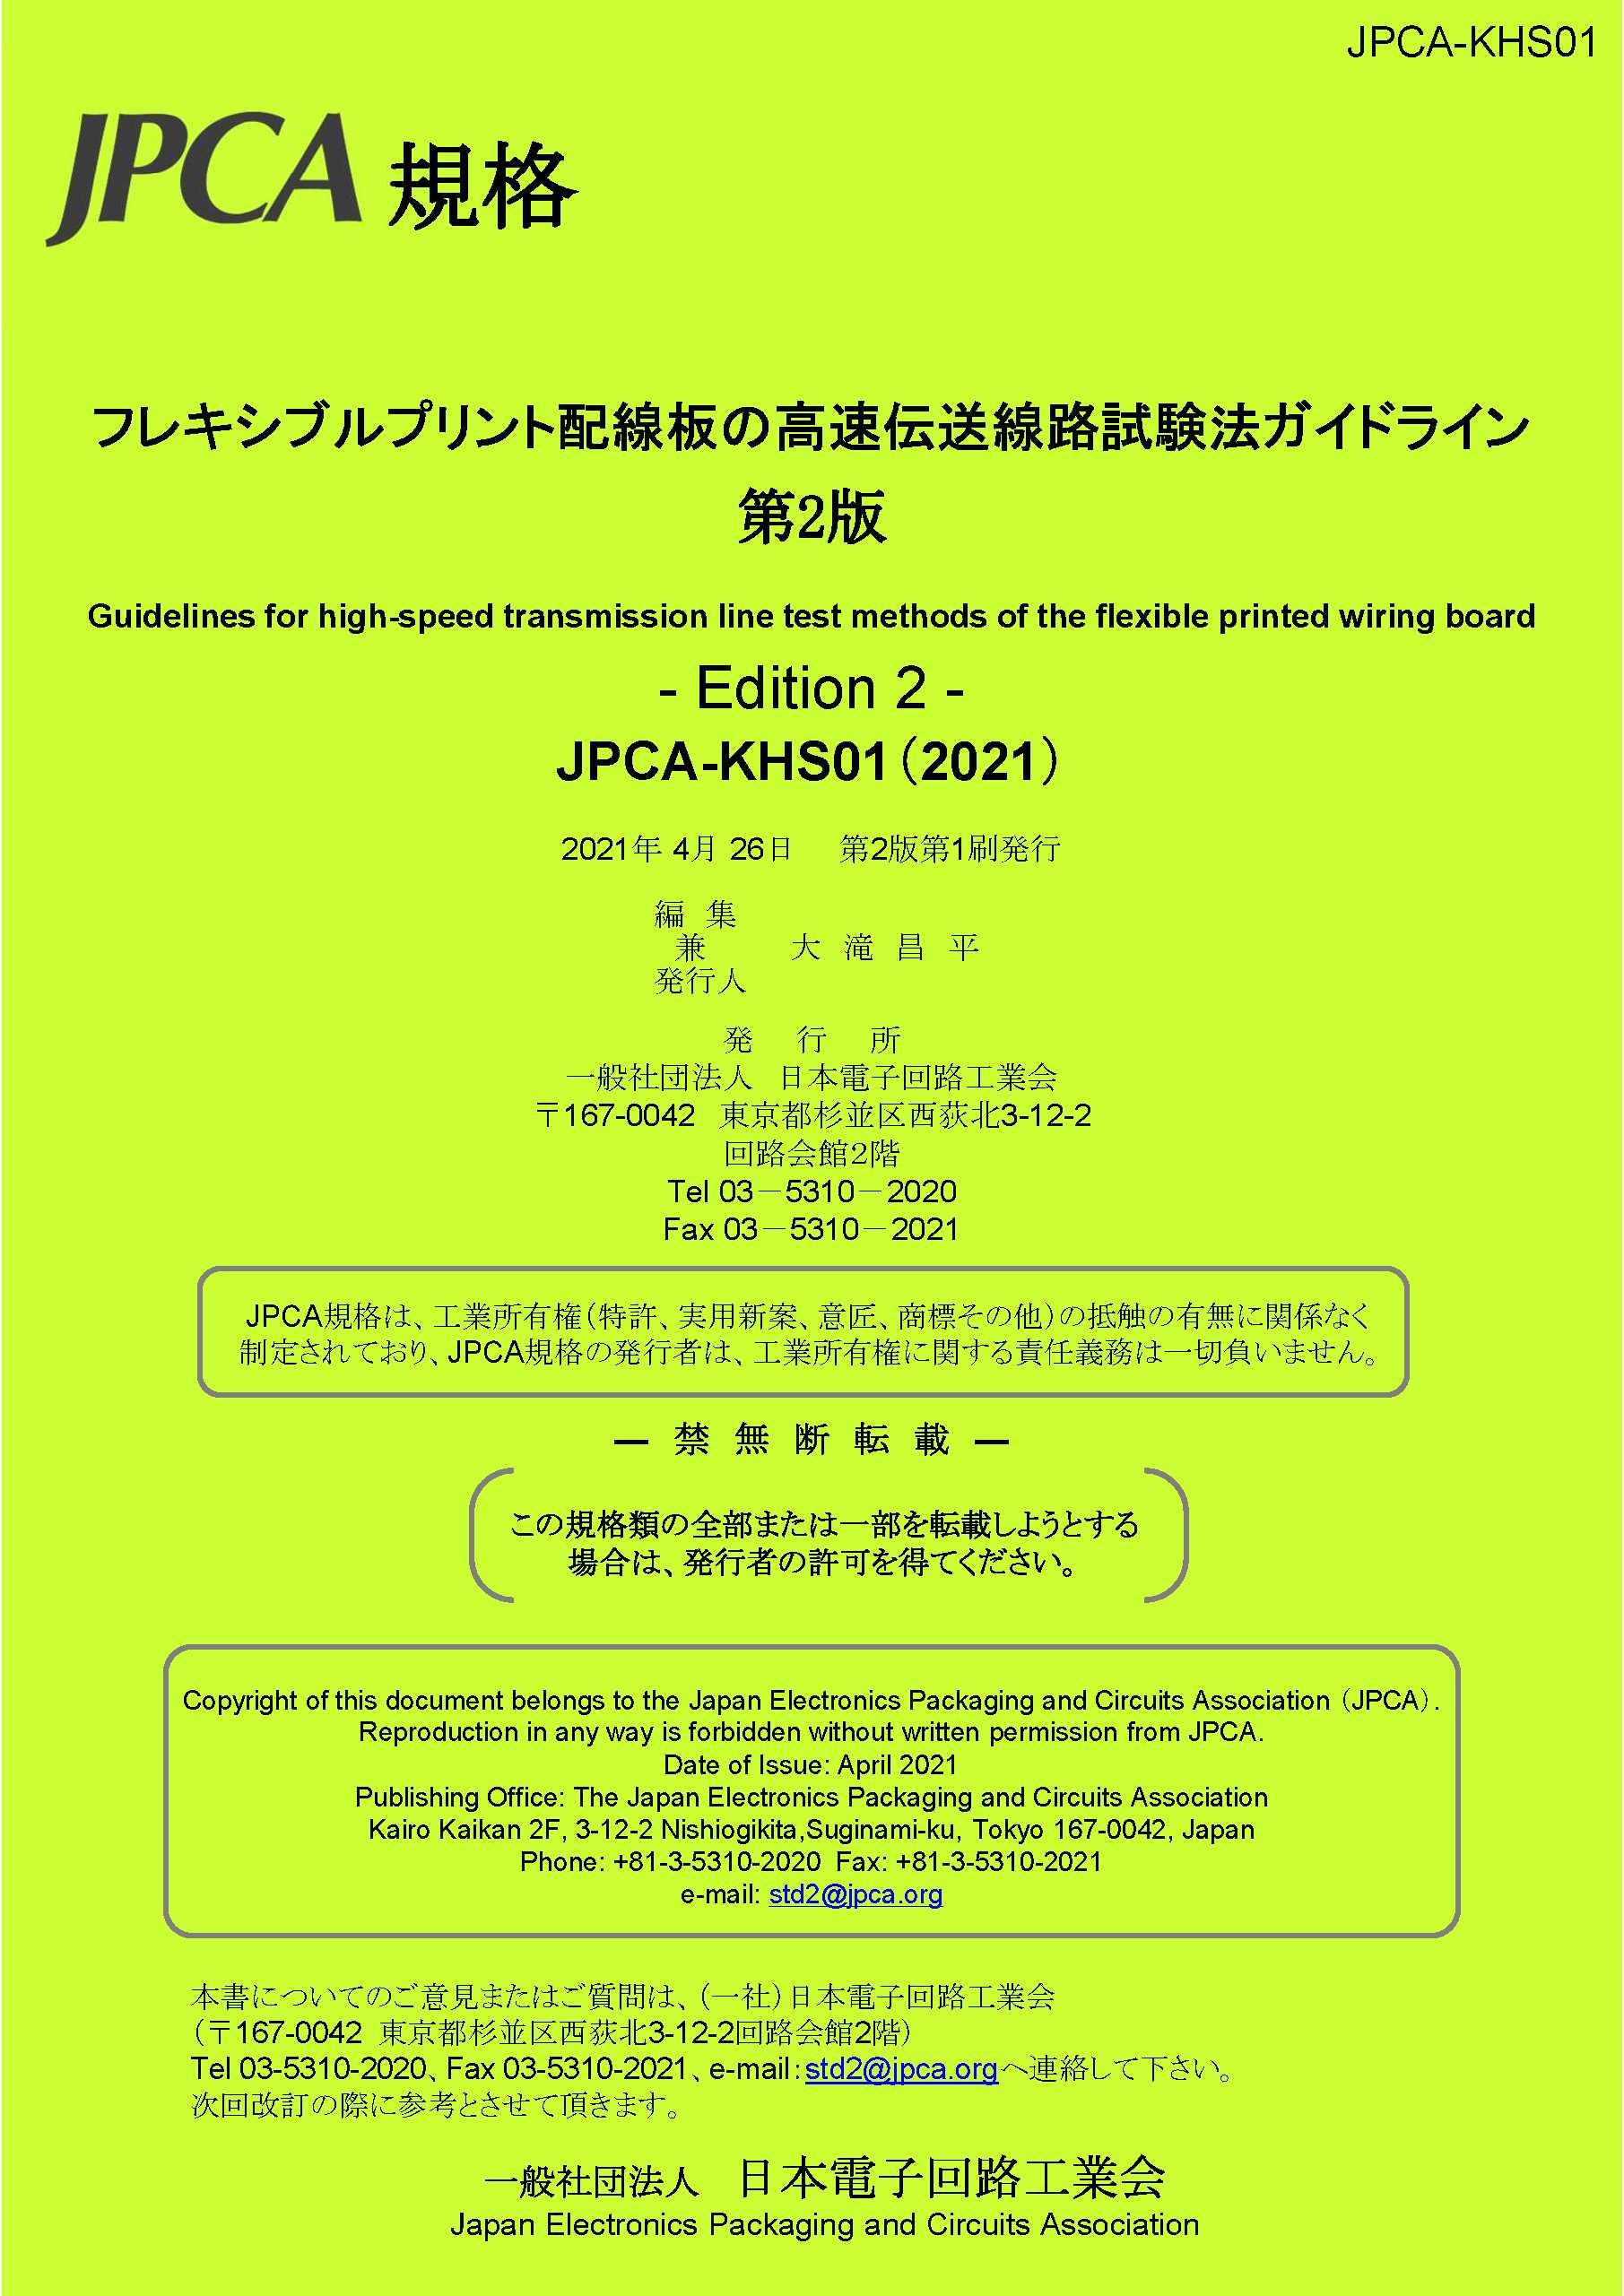 JPCA-KHS01-2021